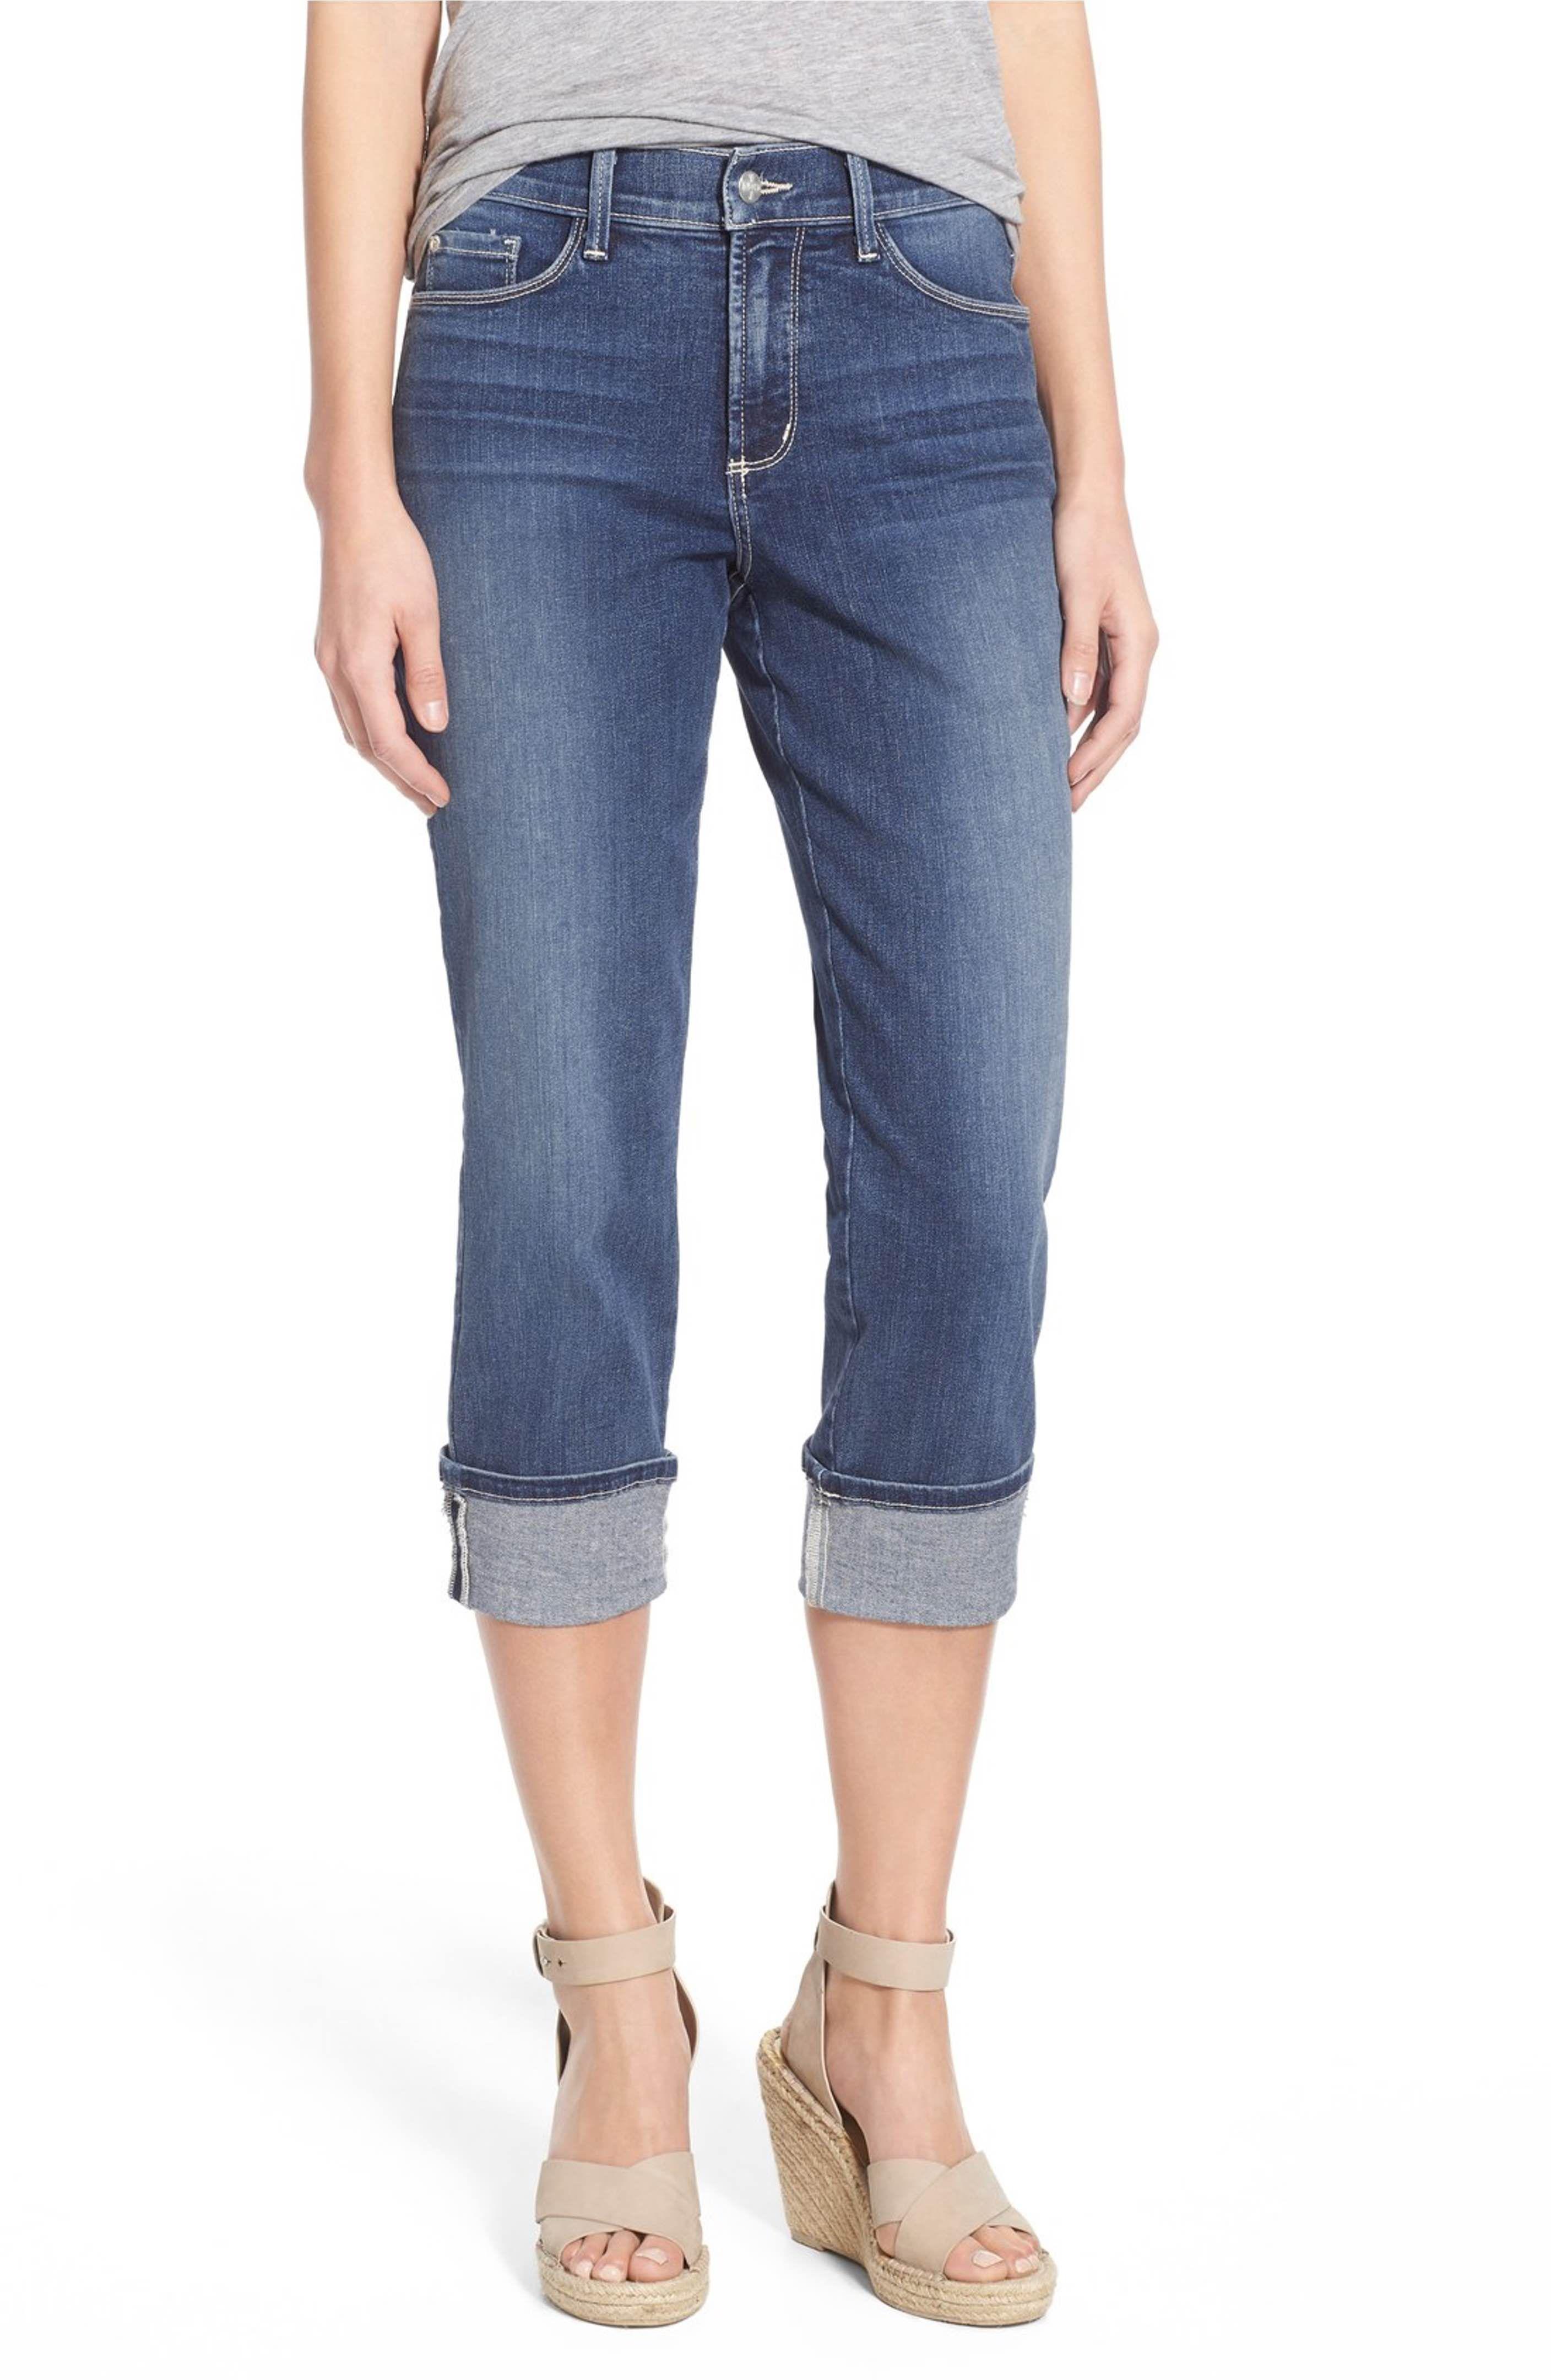 c3c7aa8fecc Main Image - NYDJ  Dayla  Colored Wide Cuff Capri Jeans (Regular   Petite)